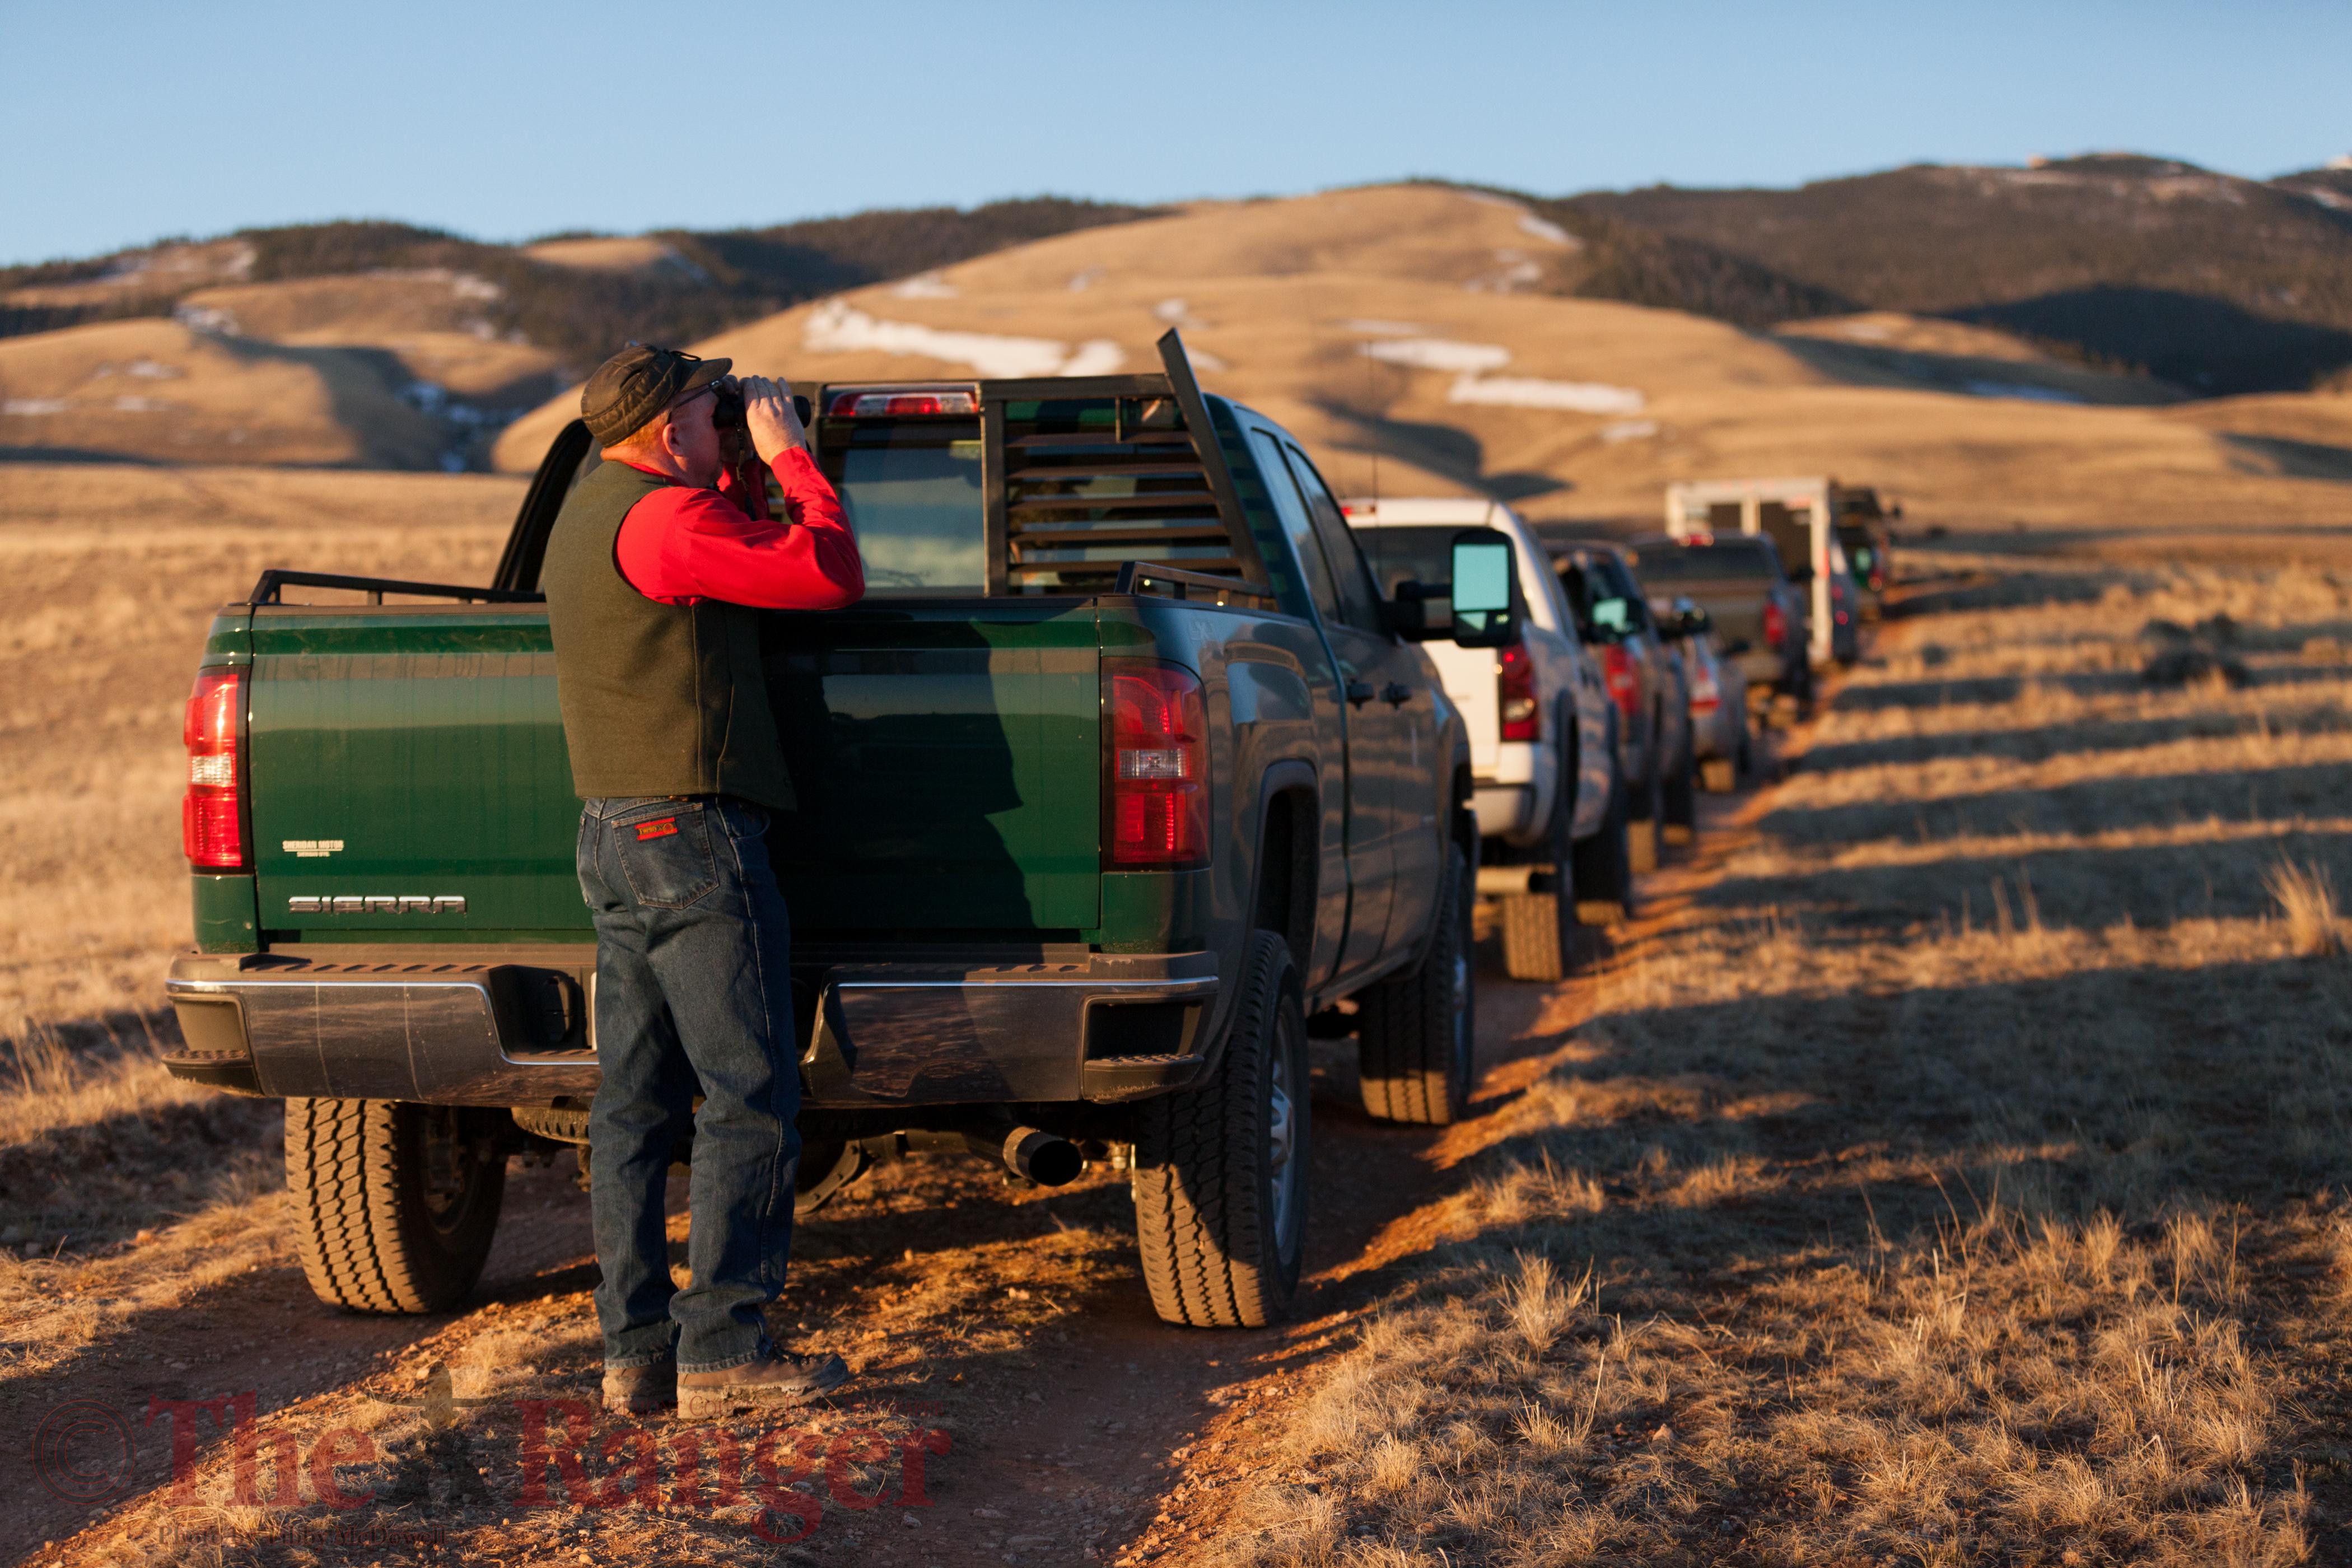 Daryl Lutz, scouting bighorn sheep during captures.